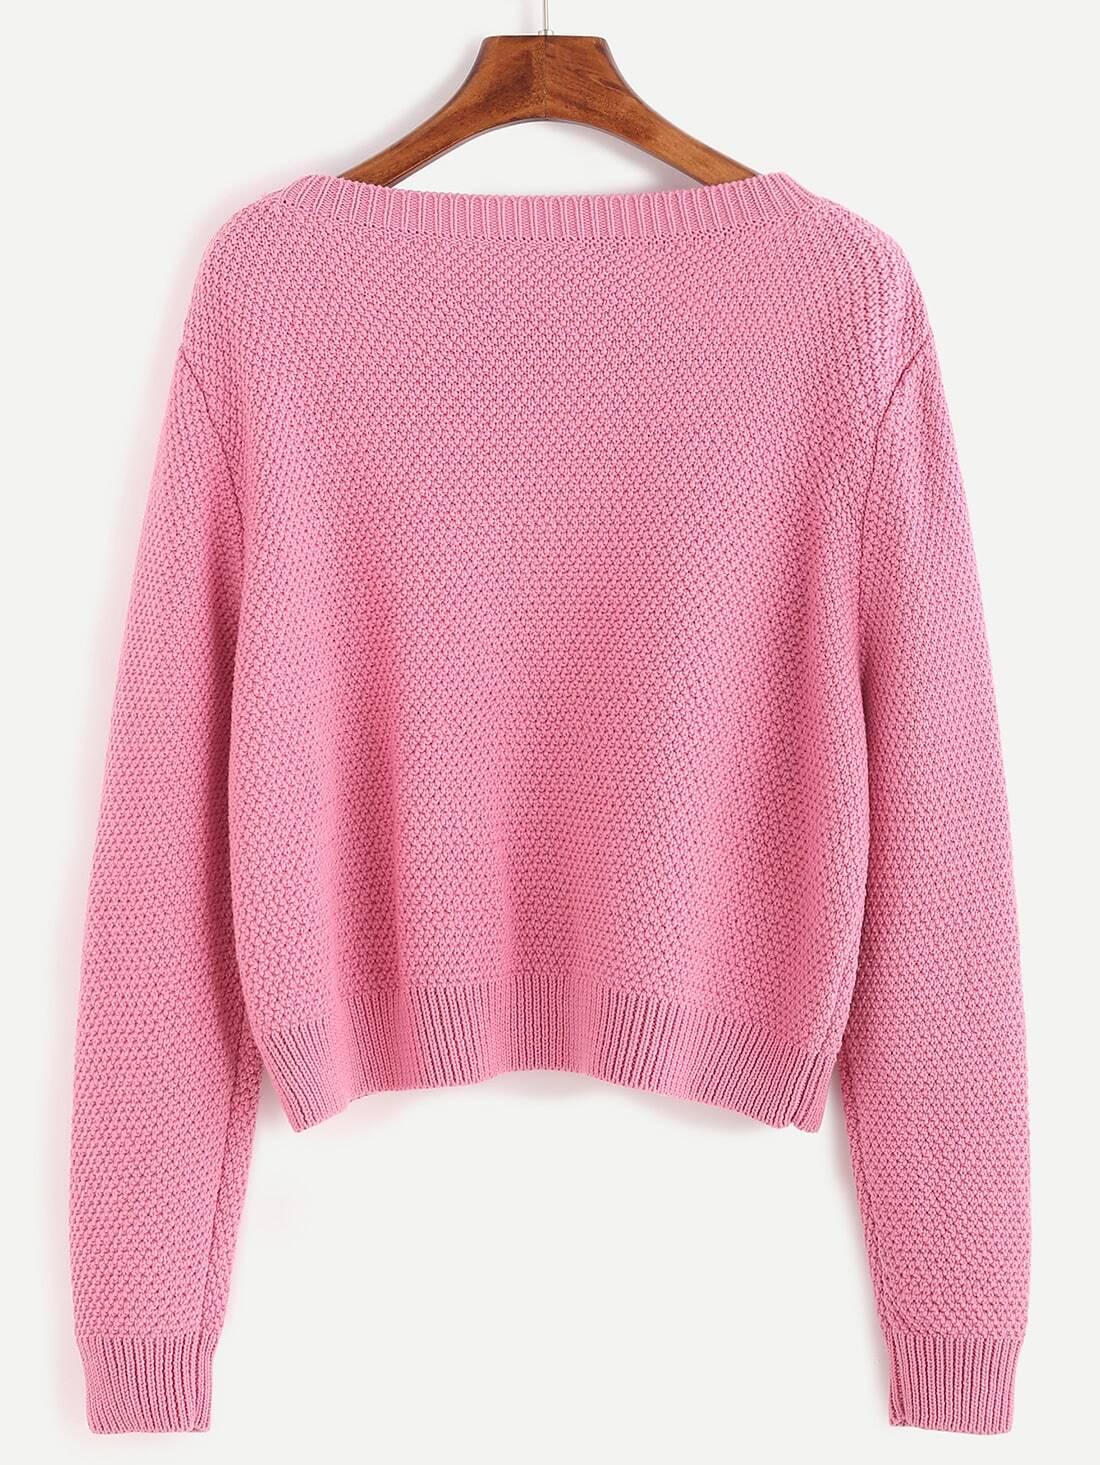 sweater160920465_2